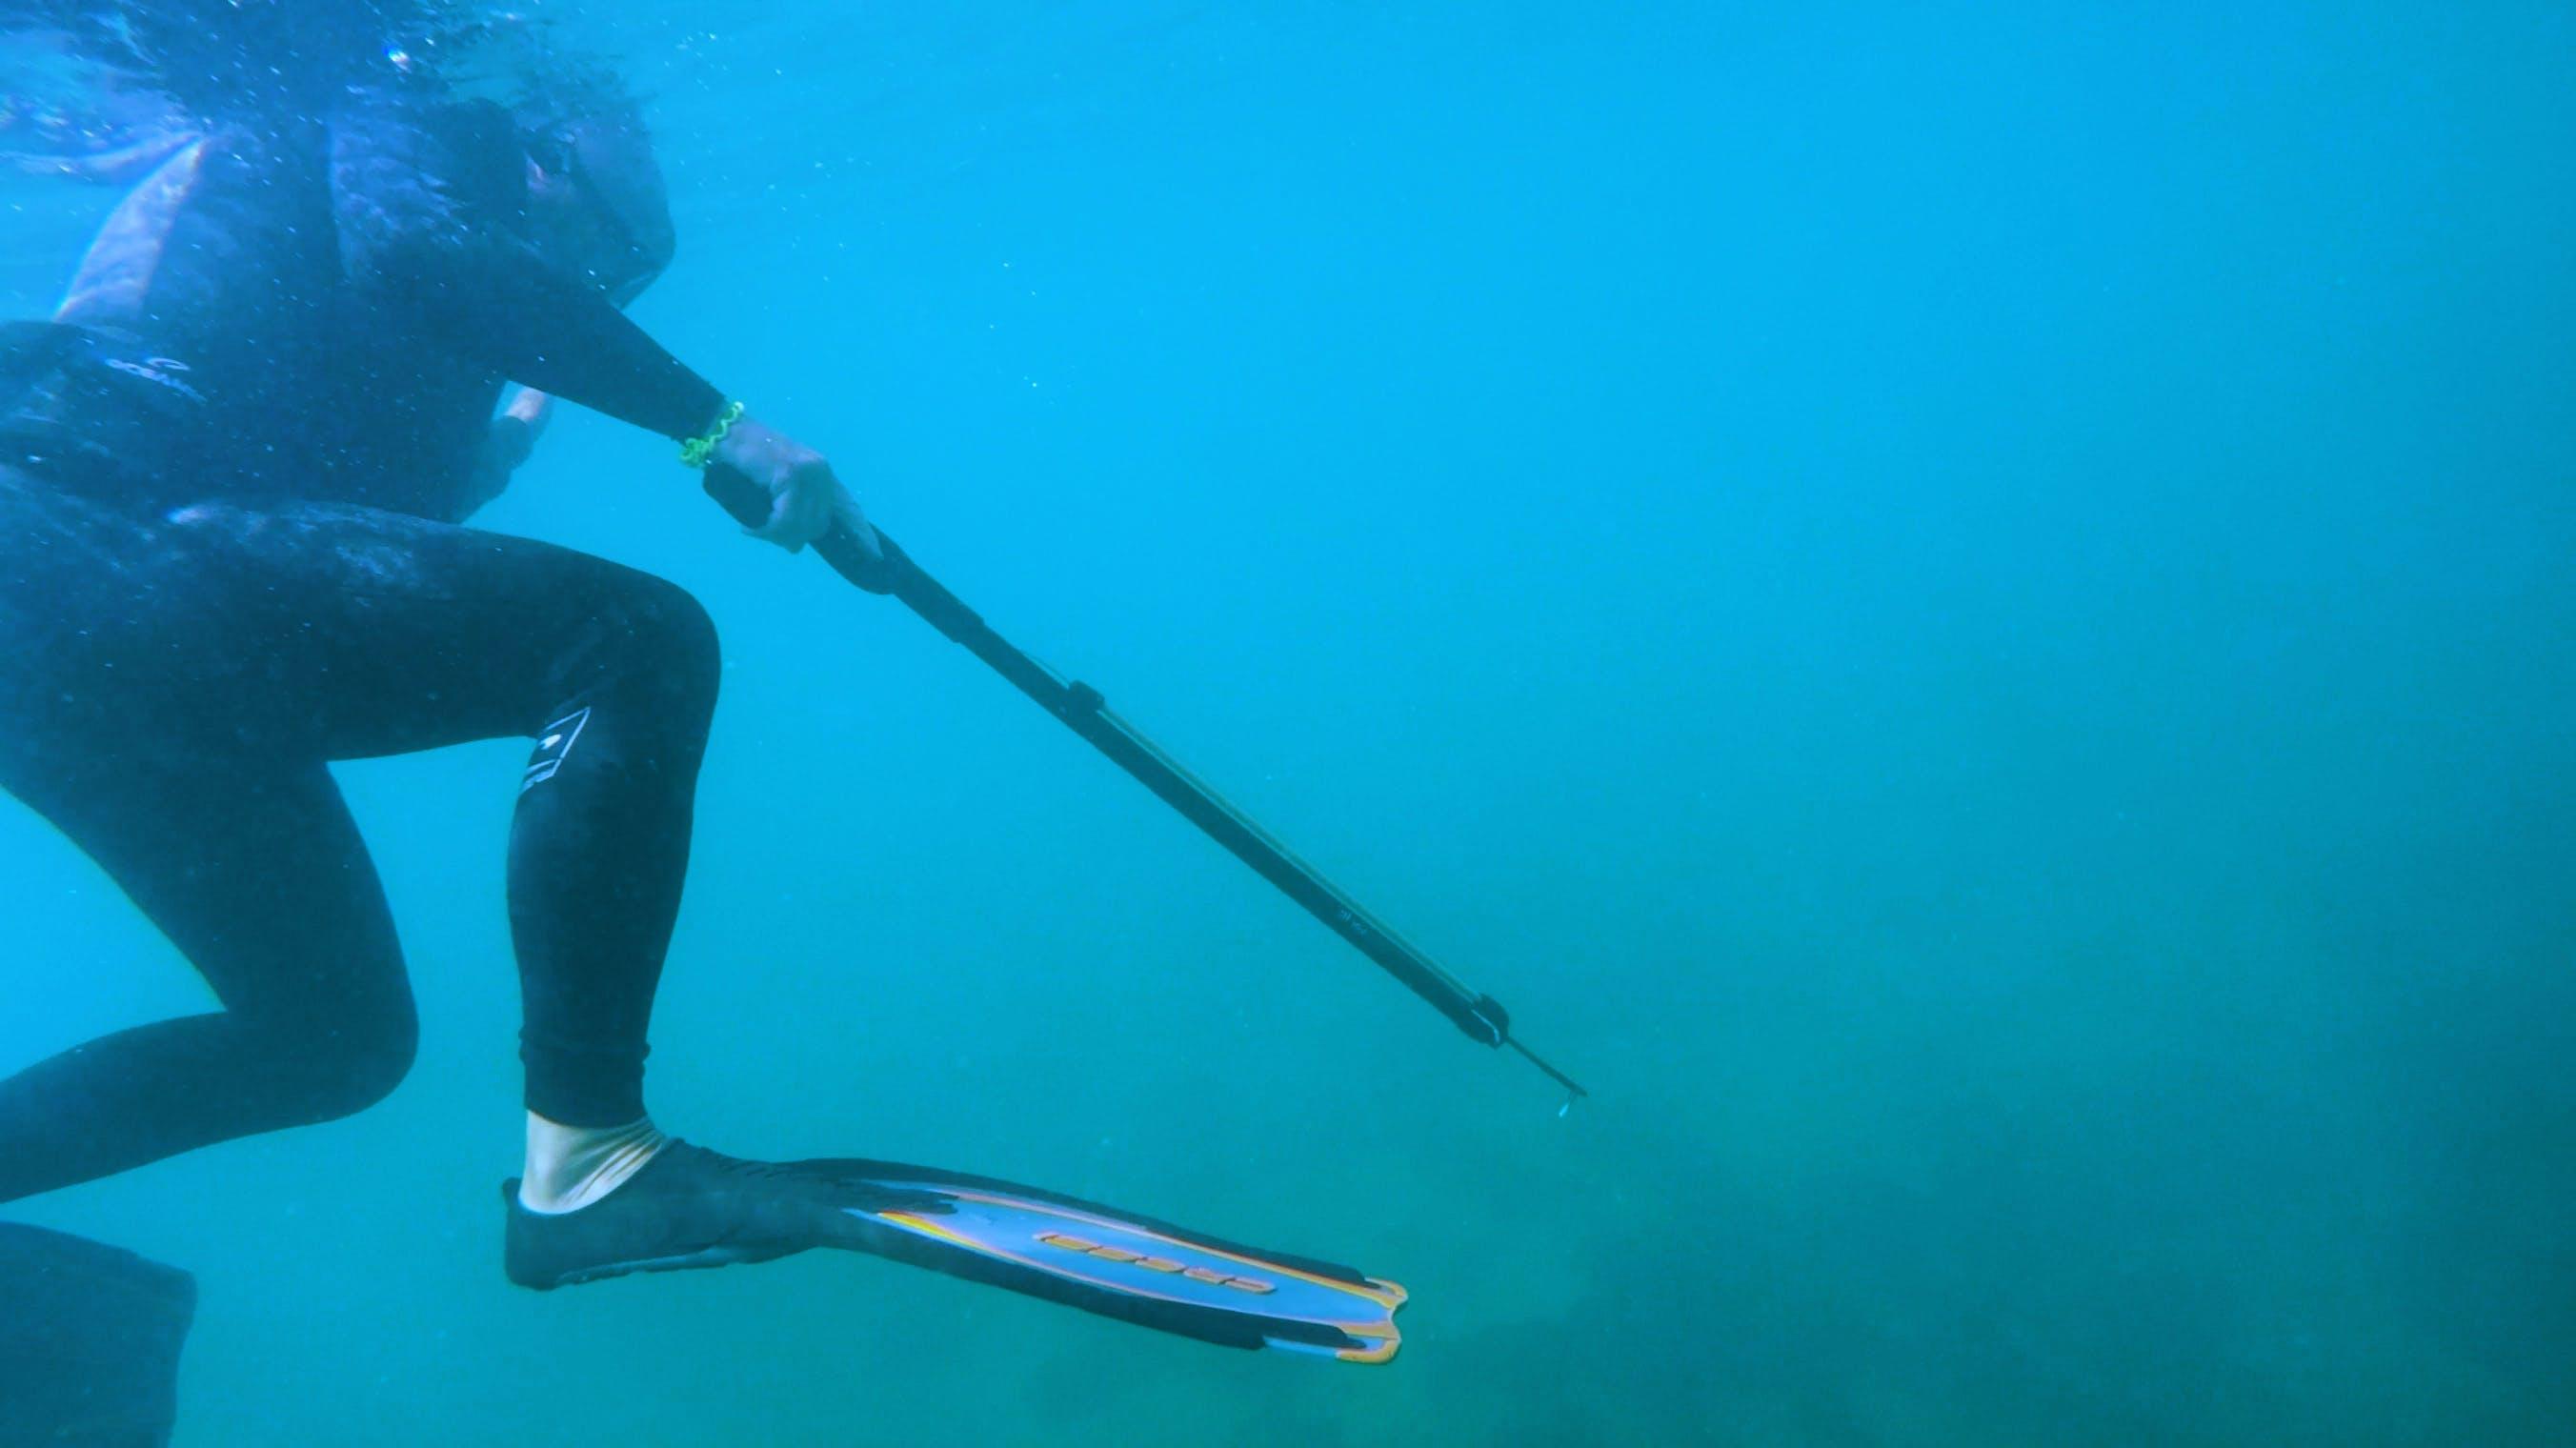 Diver Holding Speargun